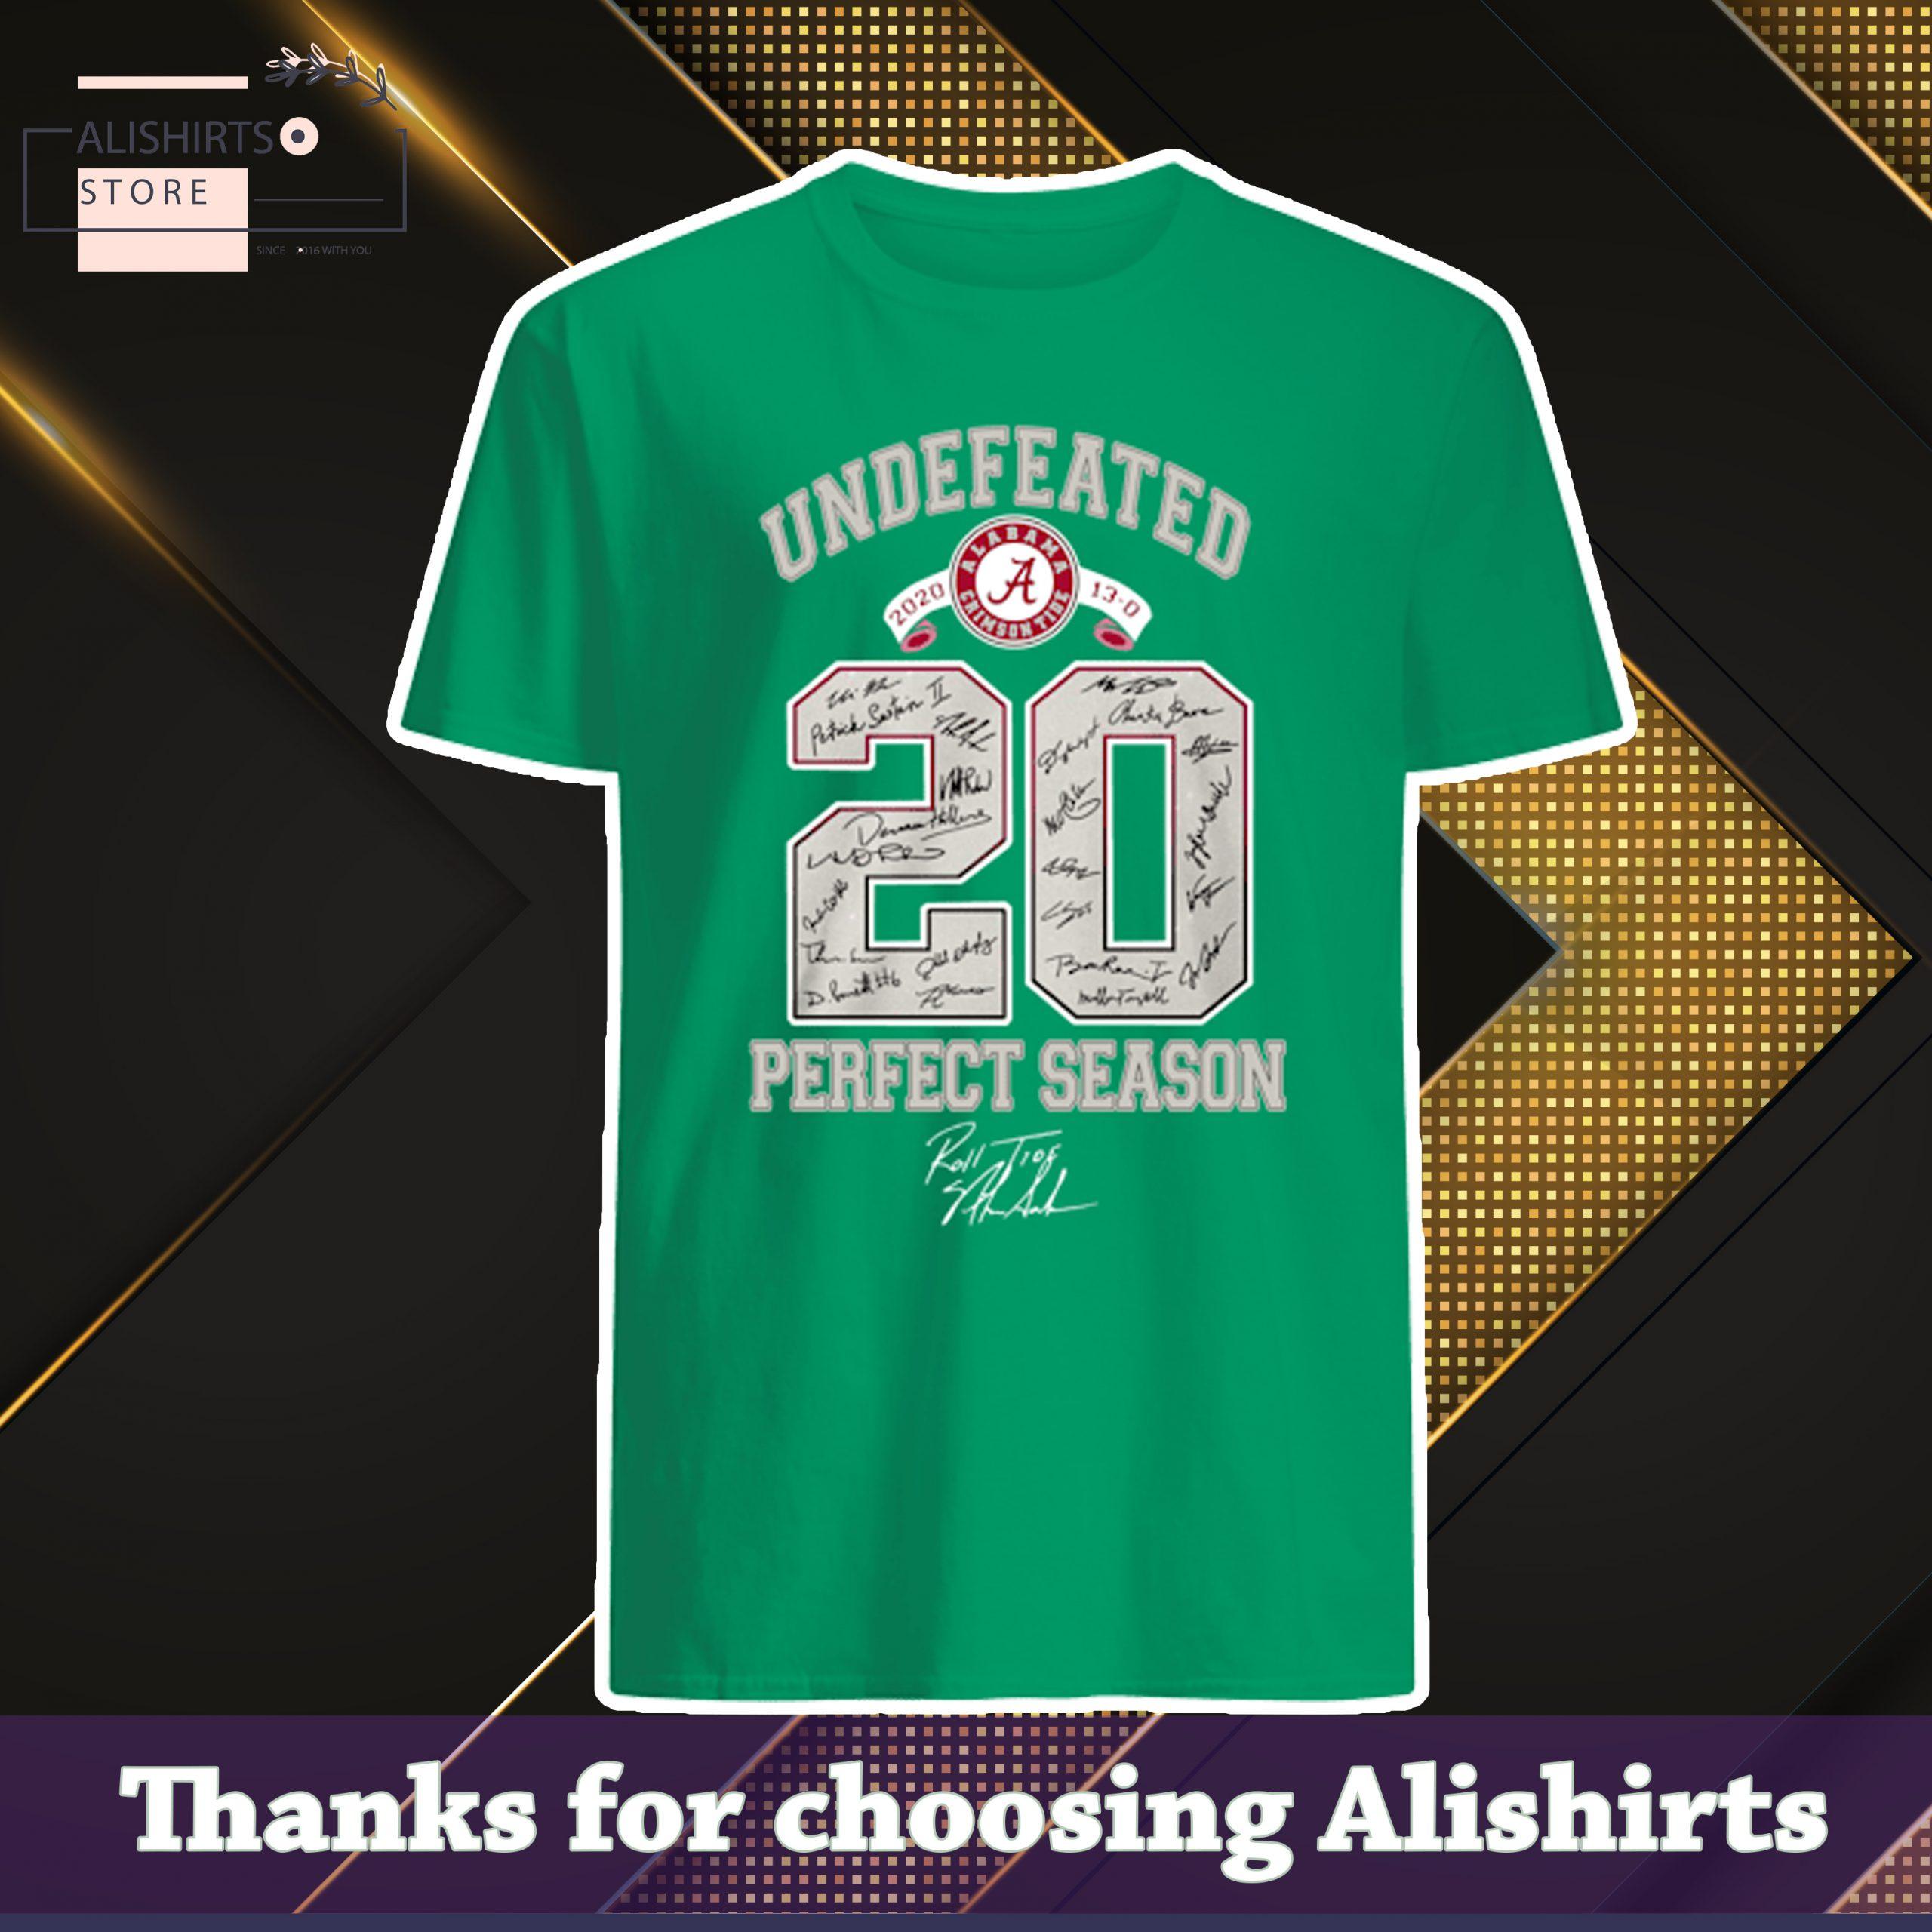 Alabama Crimson Tide undefeated 20 perfect season signatures shirt